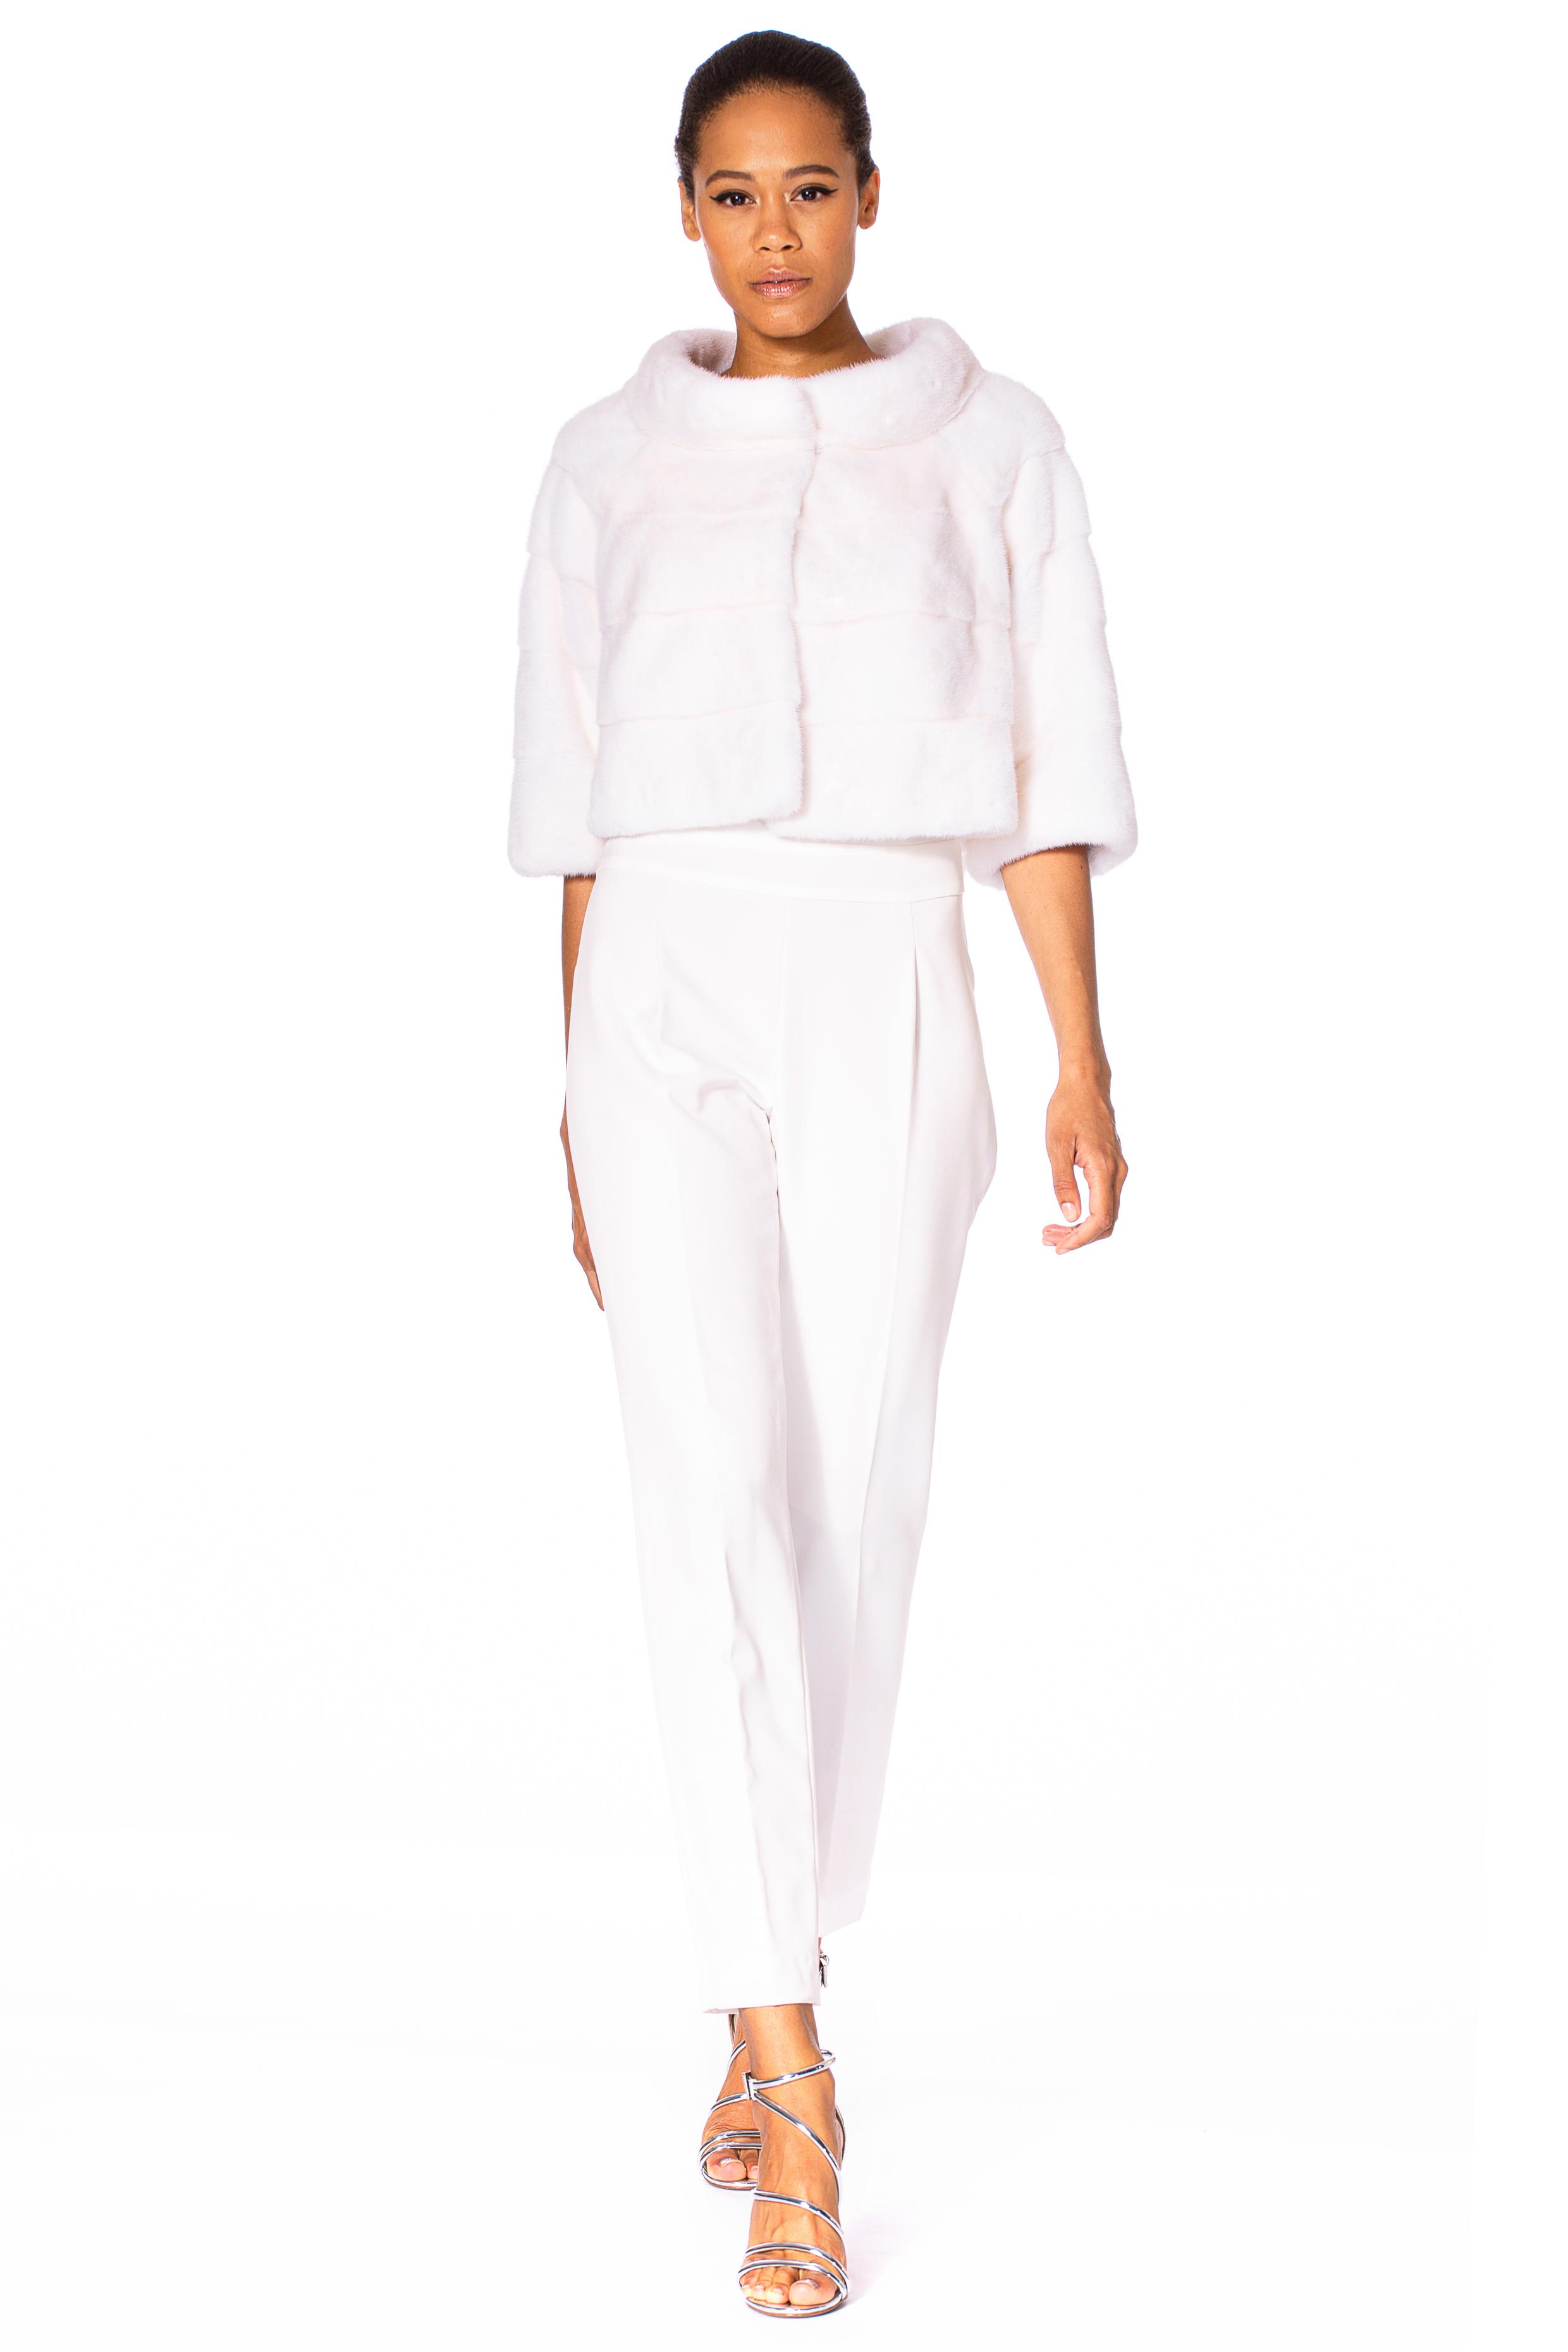 All-over-White